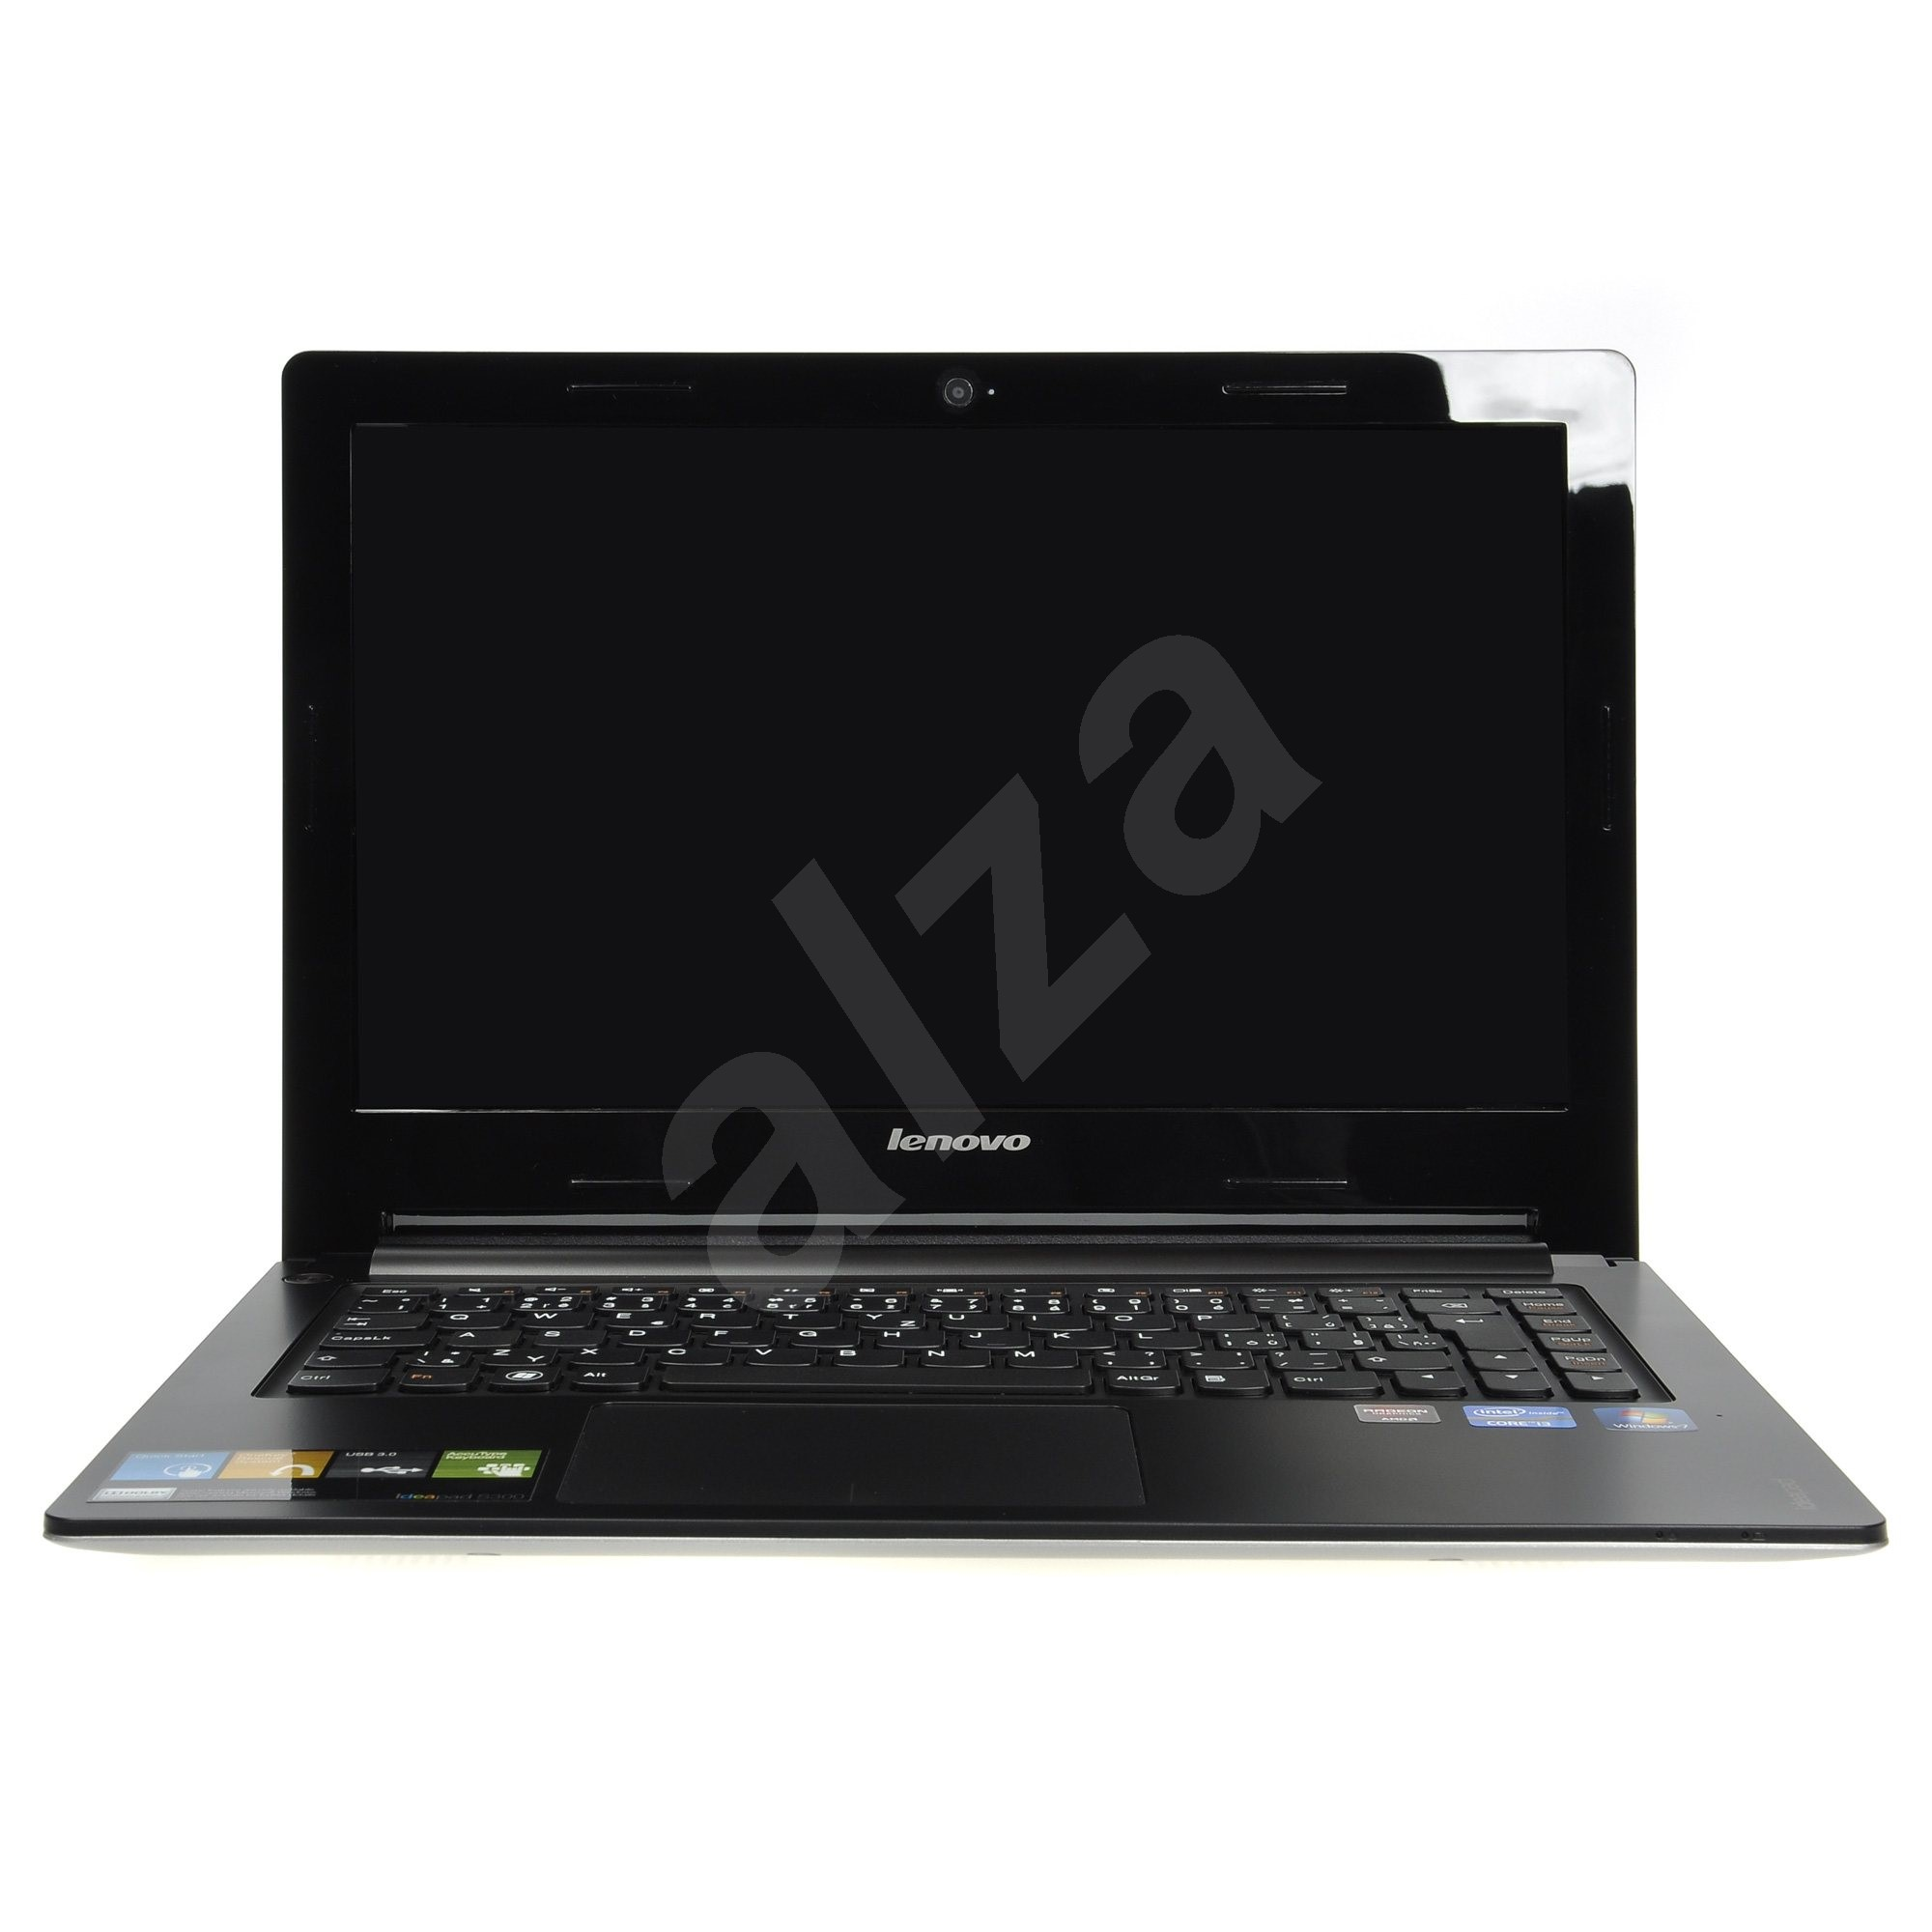 Lenovo IdeaPad S300 Graphite Grey - Notebook | Alza.cz